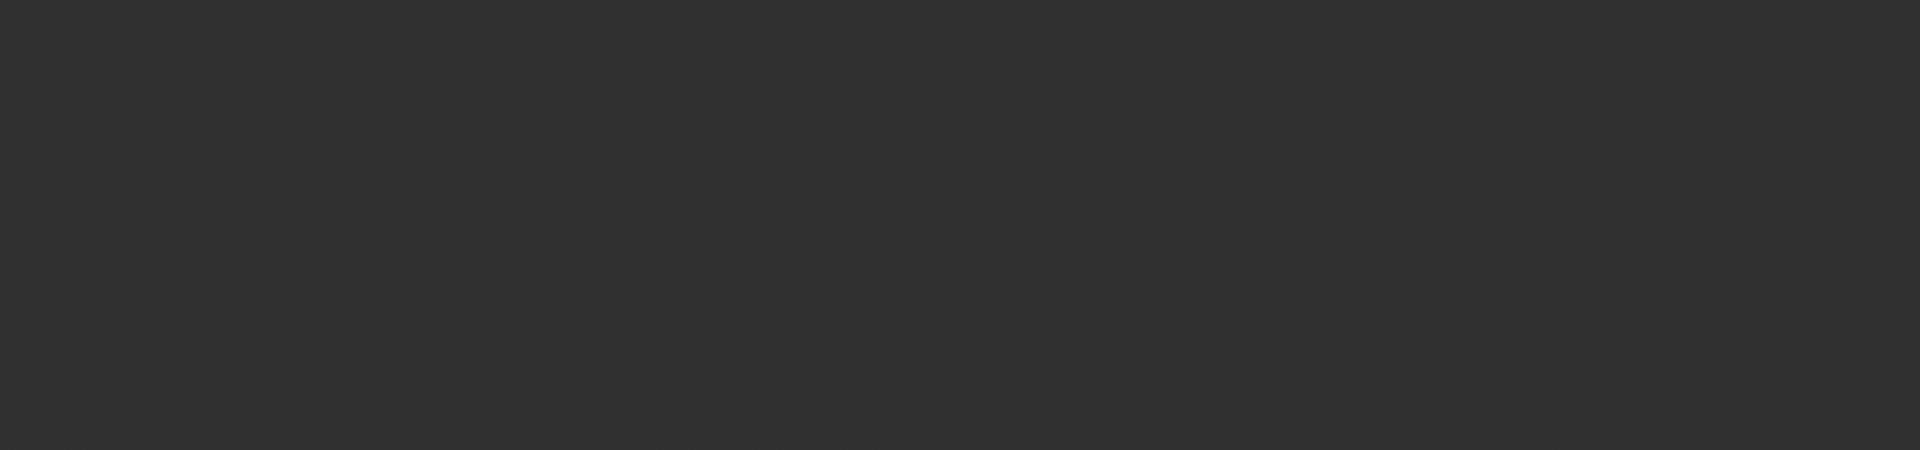 Blank-header